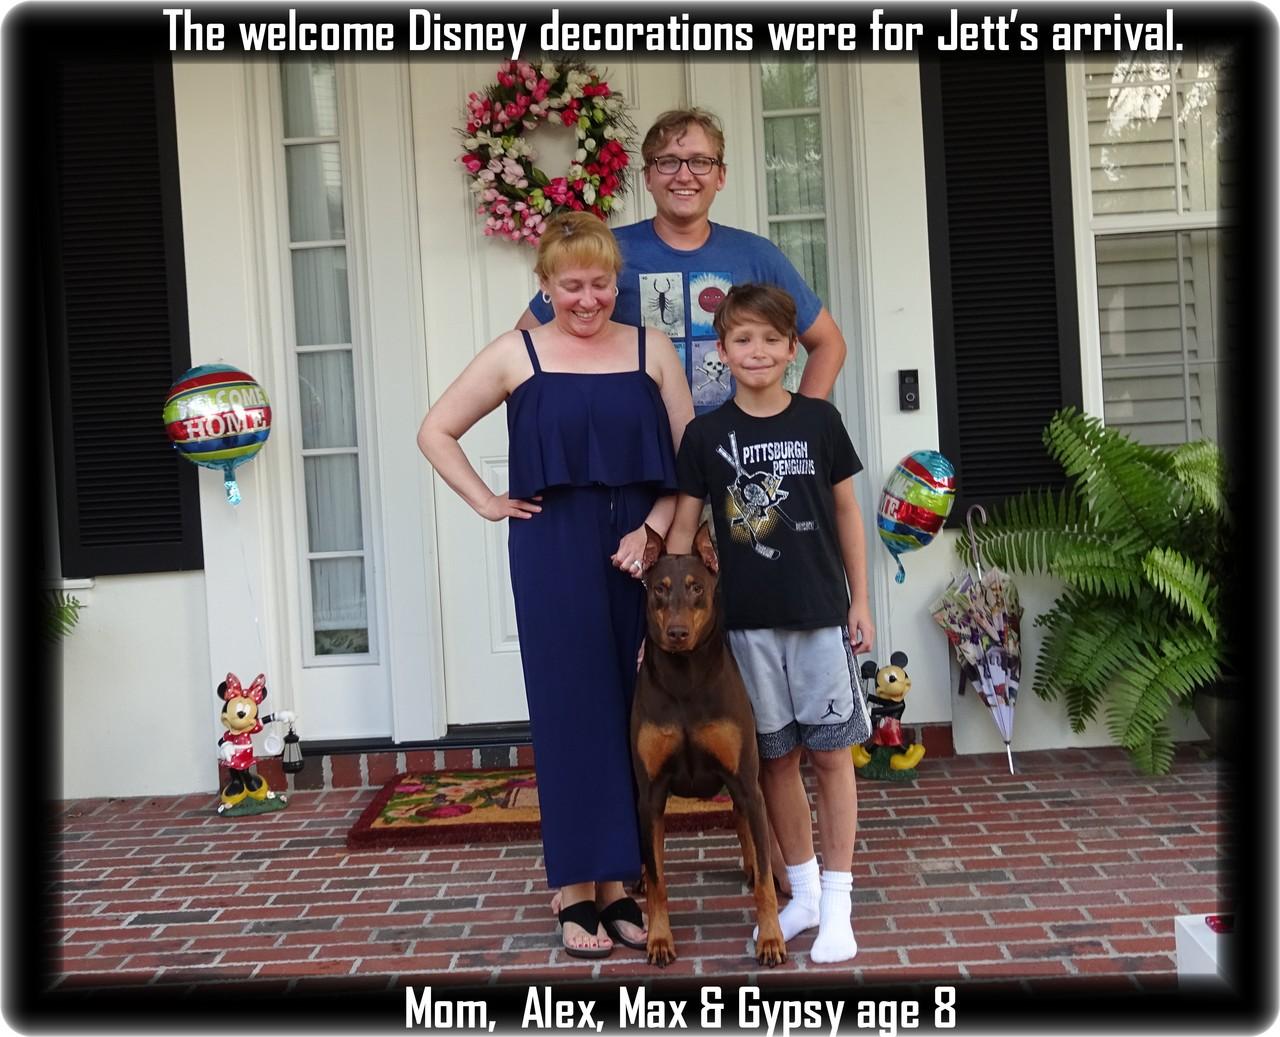 Jet / Celebration FL - Hoytt's Barron of Celebration /Grand Victor - Placed